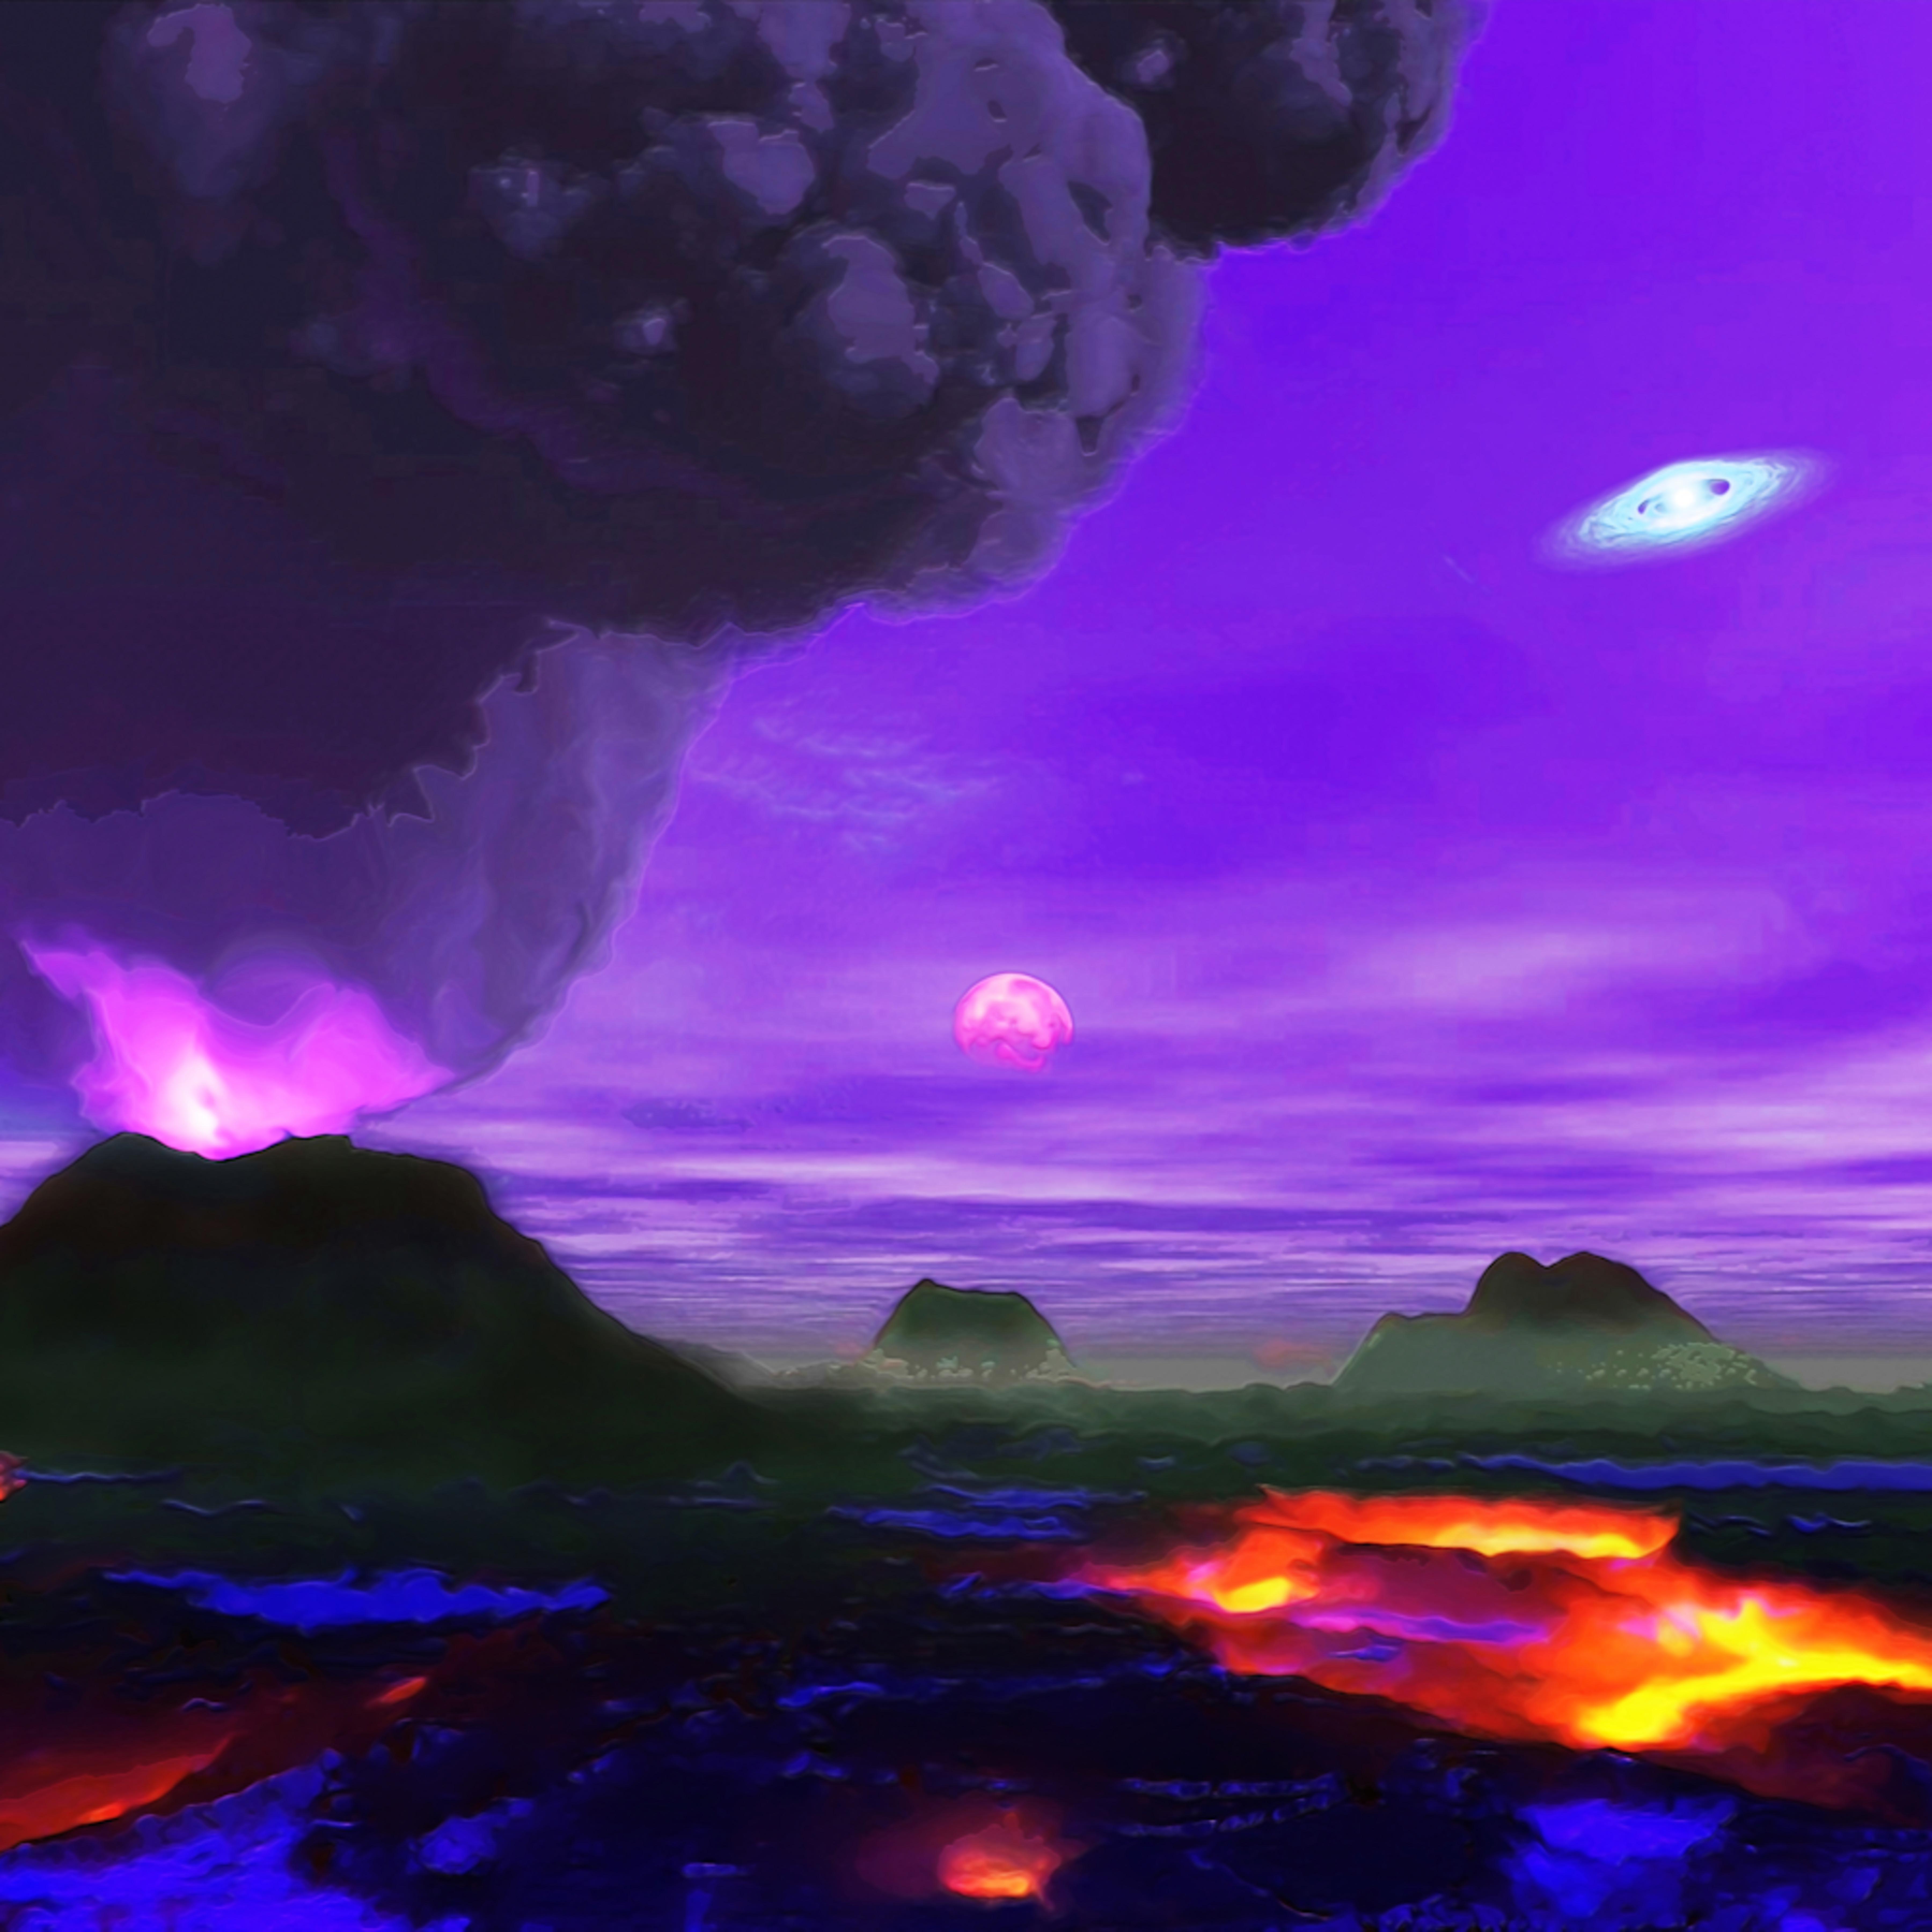 Volcano planet mnguku